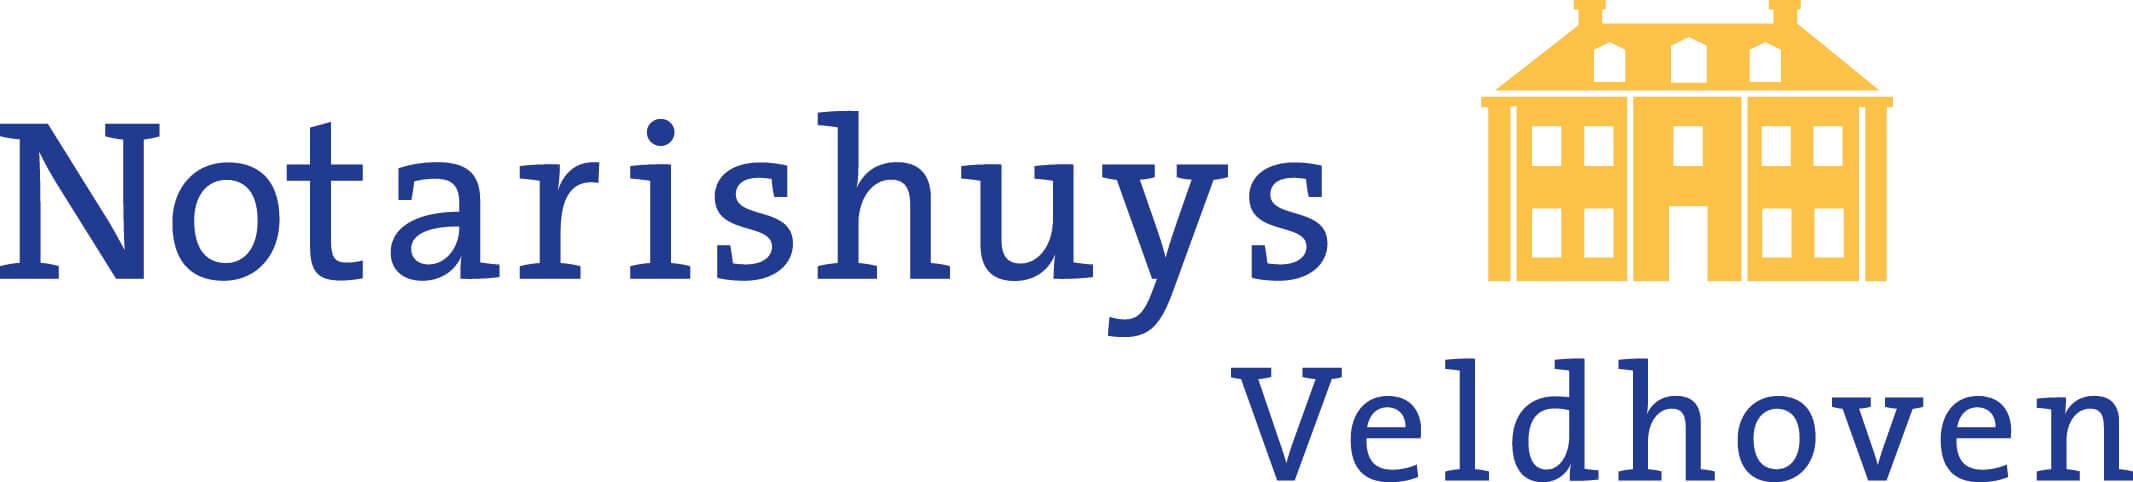 Notarishuys logo